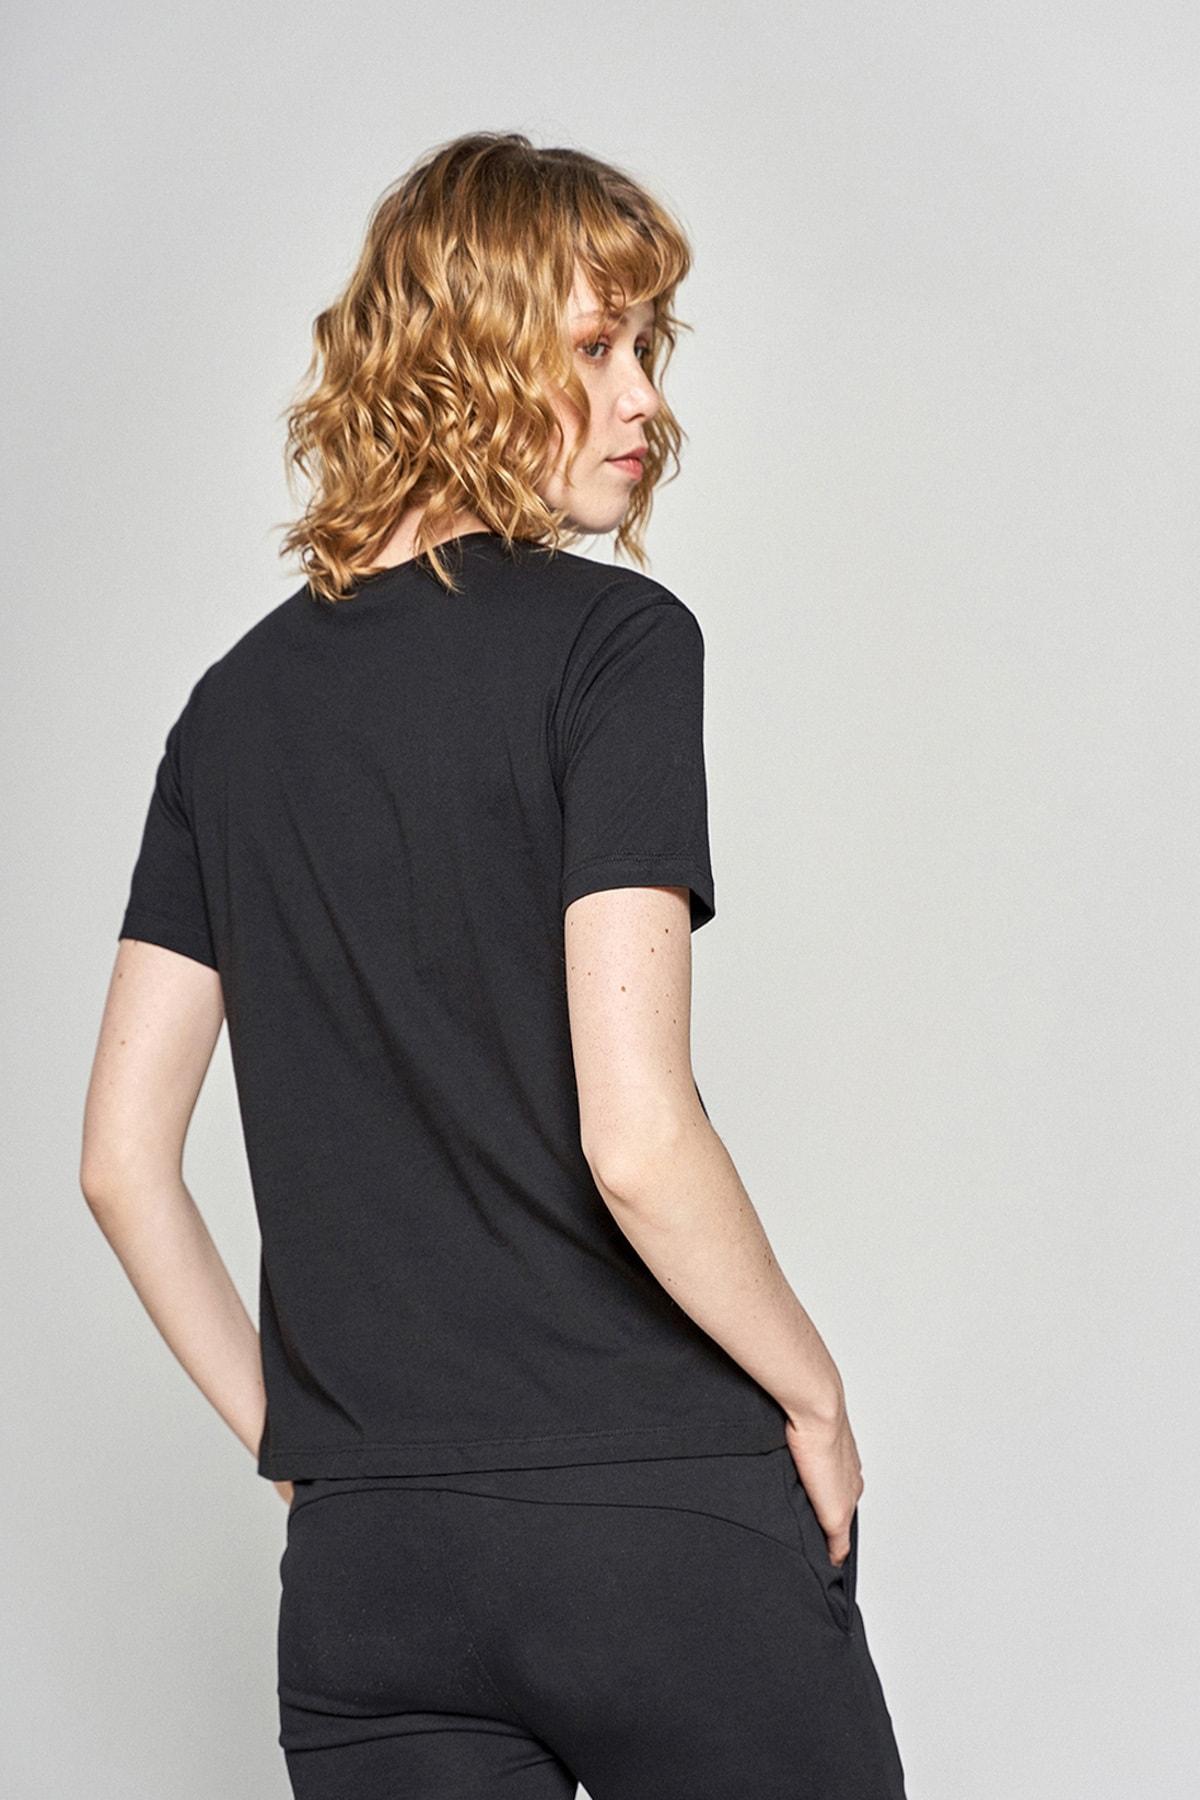 HUMMEL Kadın Siyah Jasmine T-shirt 911192-2001 2